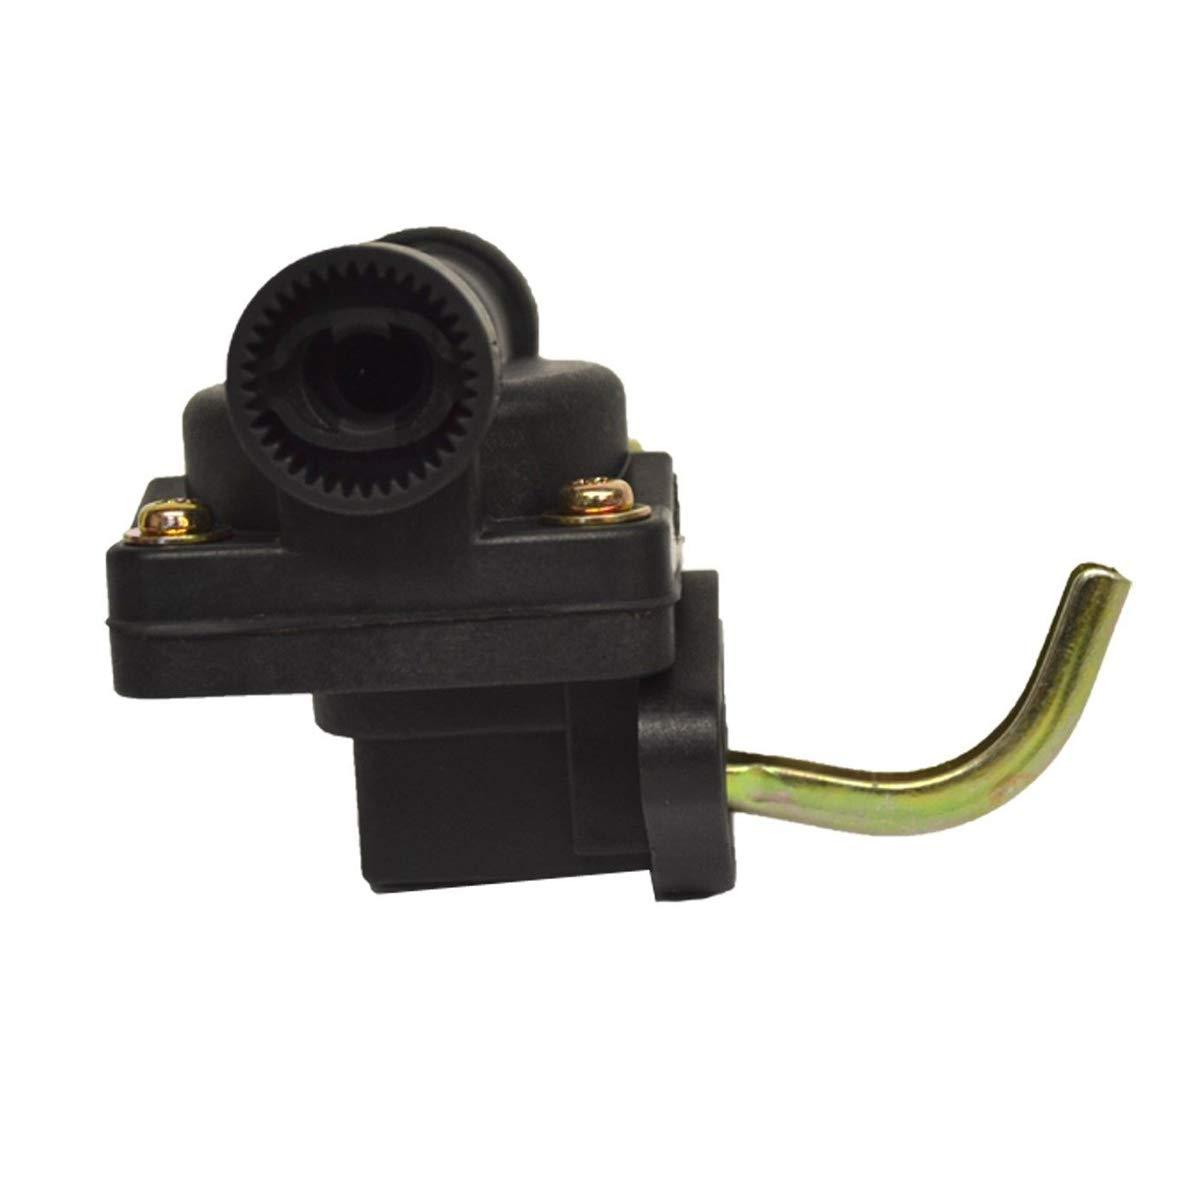 Replaces Part NO.: 12 393 03 12 559 01 12 559 01-S HAOCHENG Triumilynn 1255902-S Fuel Pump for Kohler Lawn /& Garden Equipment Engine CH11-CH15 CV11-CV16 HP Motor